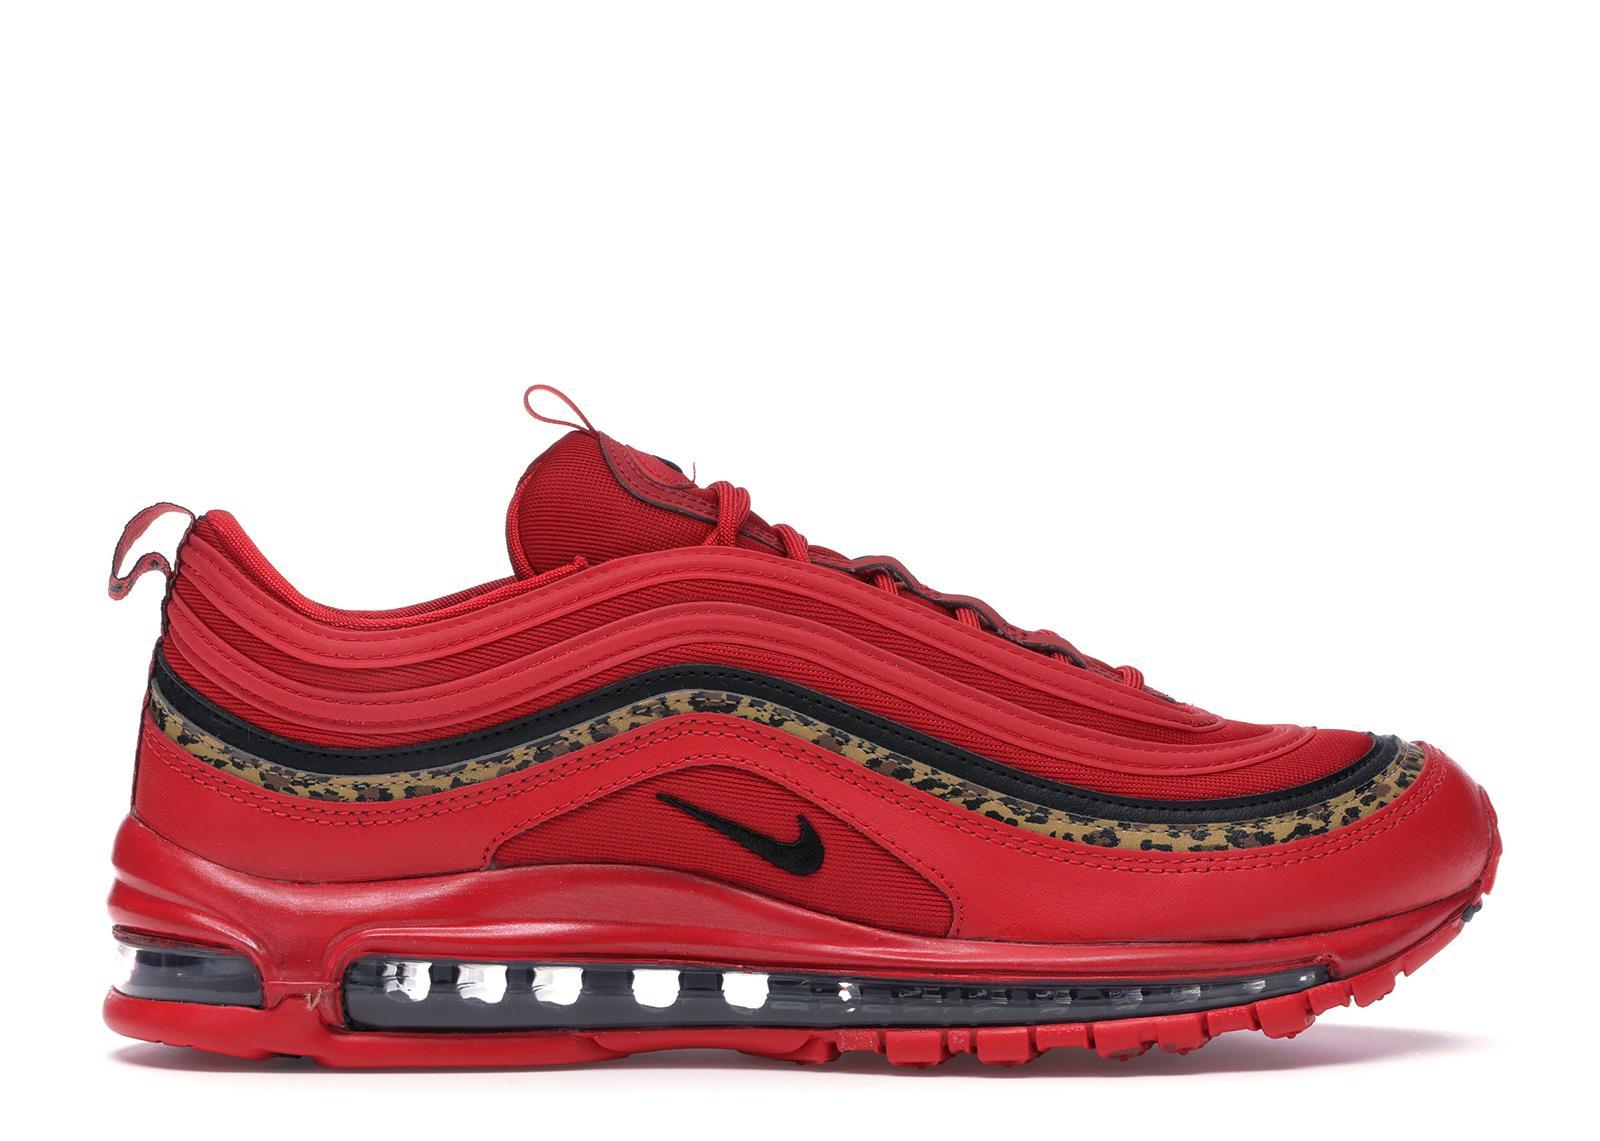 Nike Wmns Air Max 97 Premium Pink Silt Red | Sneak art